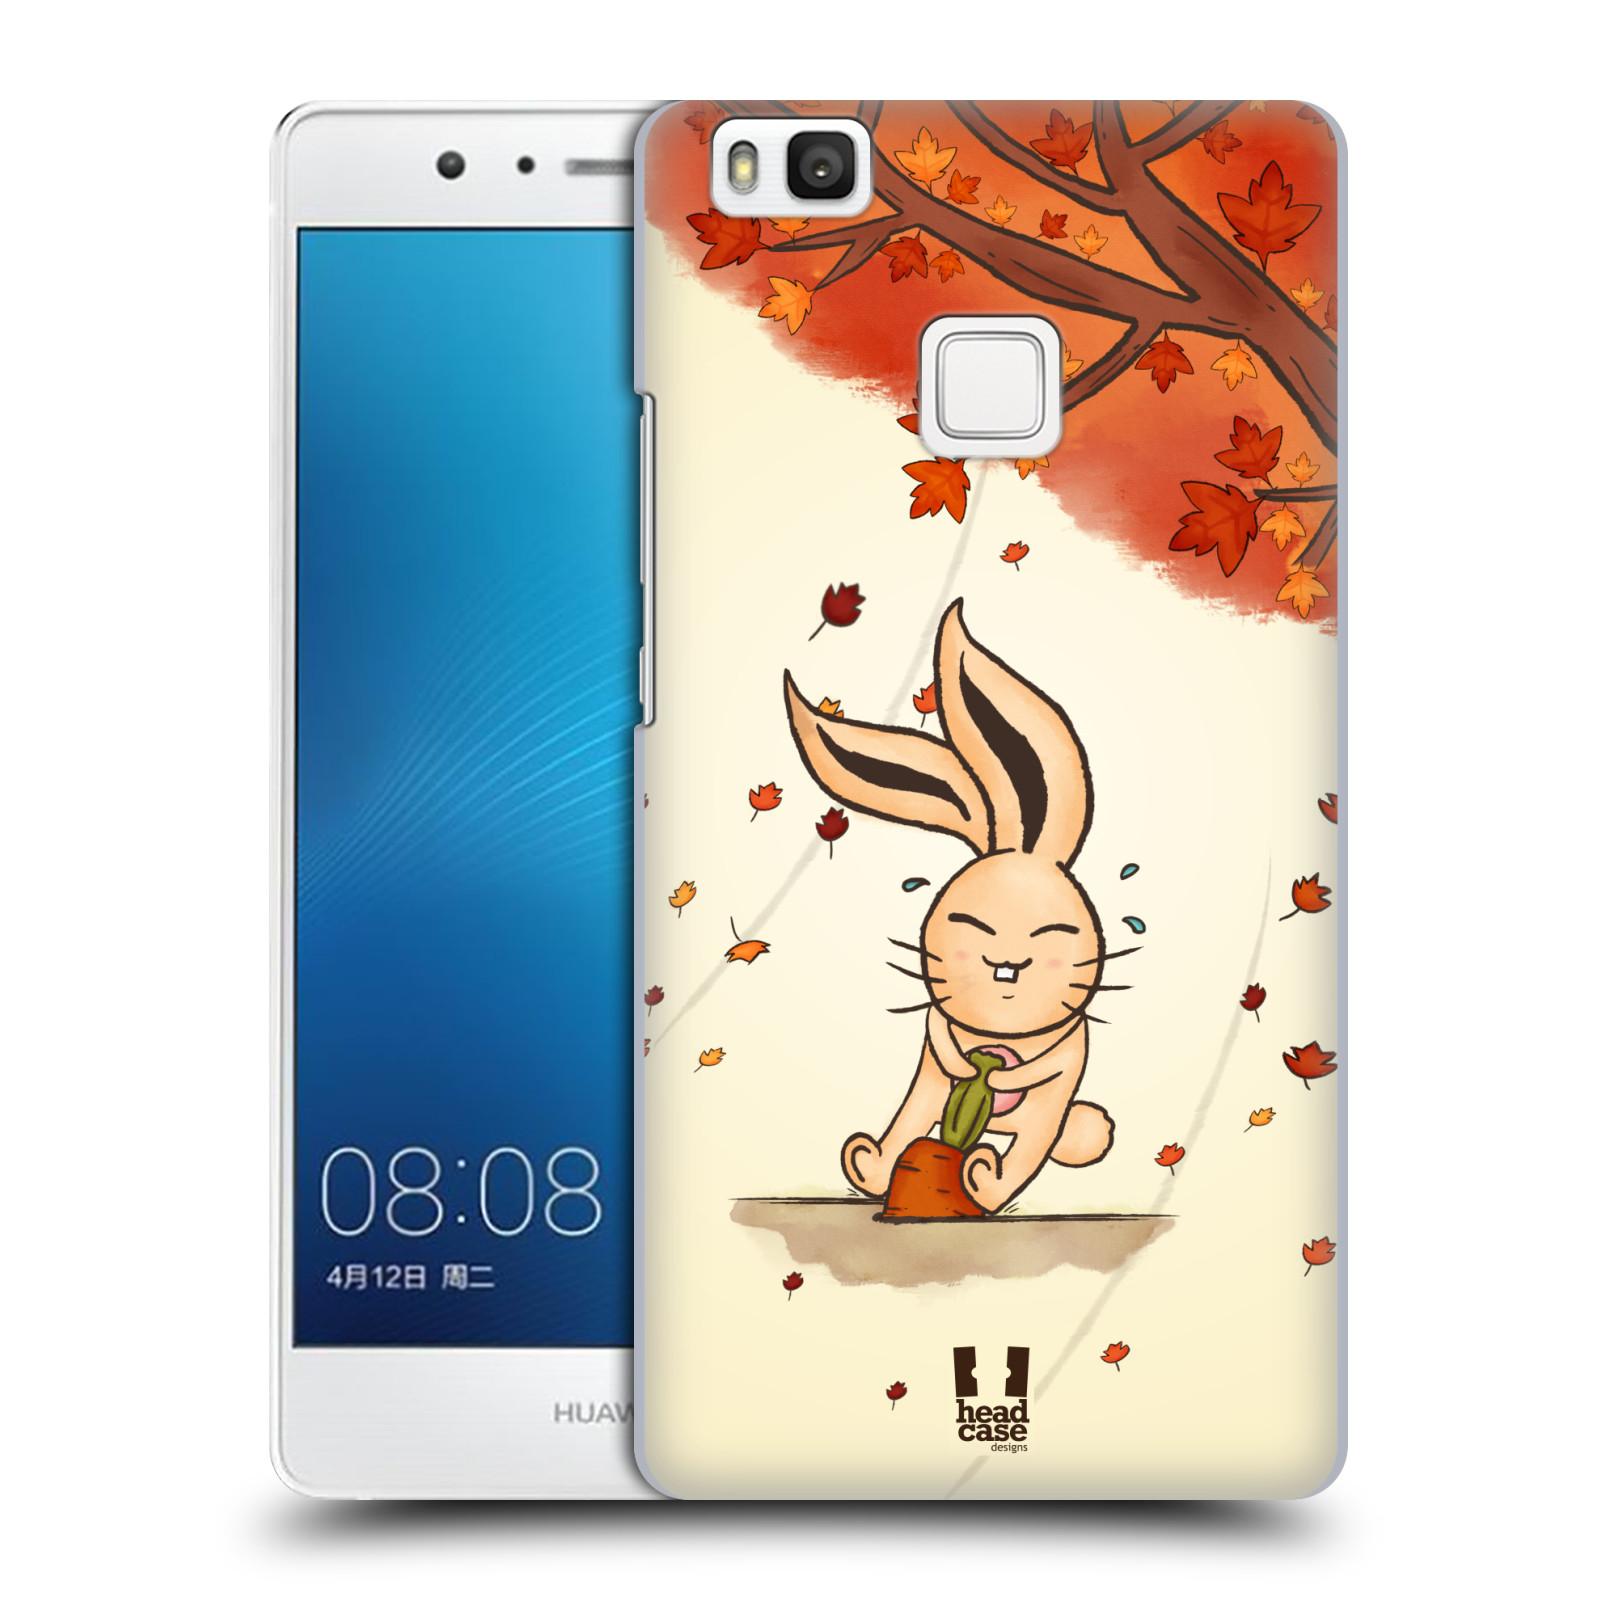 HEAD CASE plastový obal na mobil Huawei P9 LITE / P9 LITE DUAL SIM vzor podzimní zvířátka zajíček a mrkev